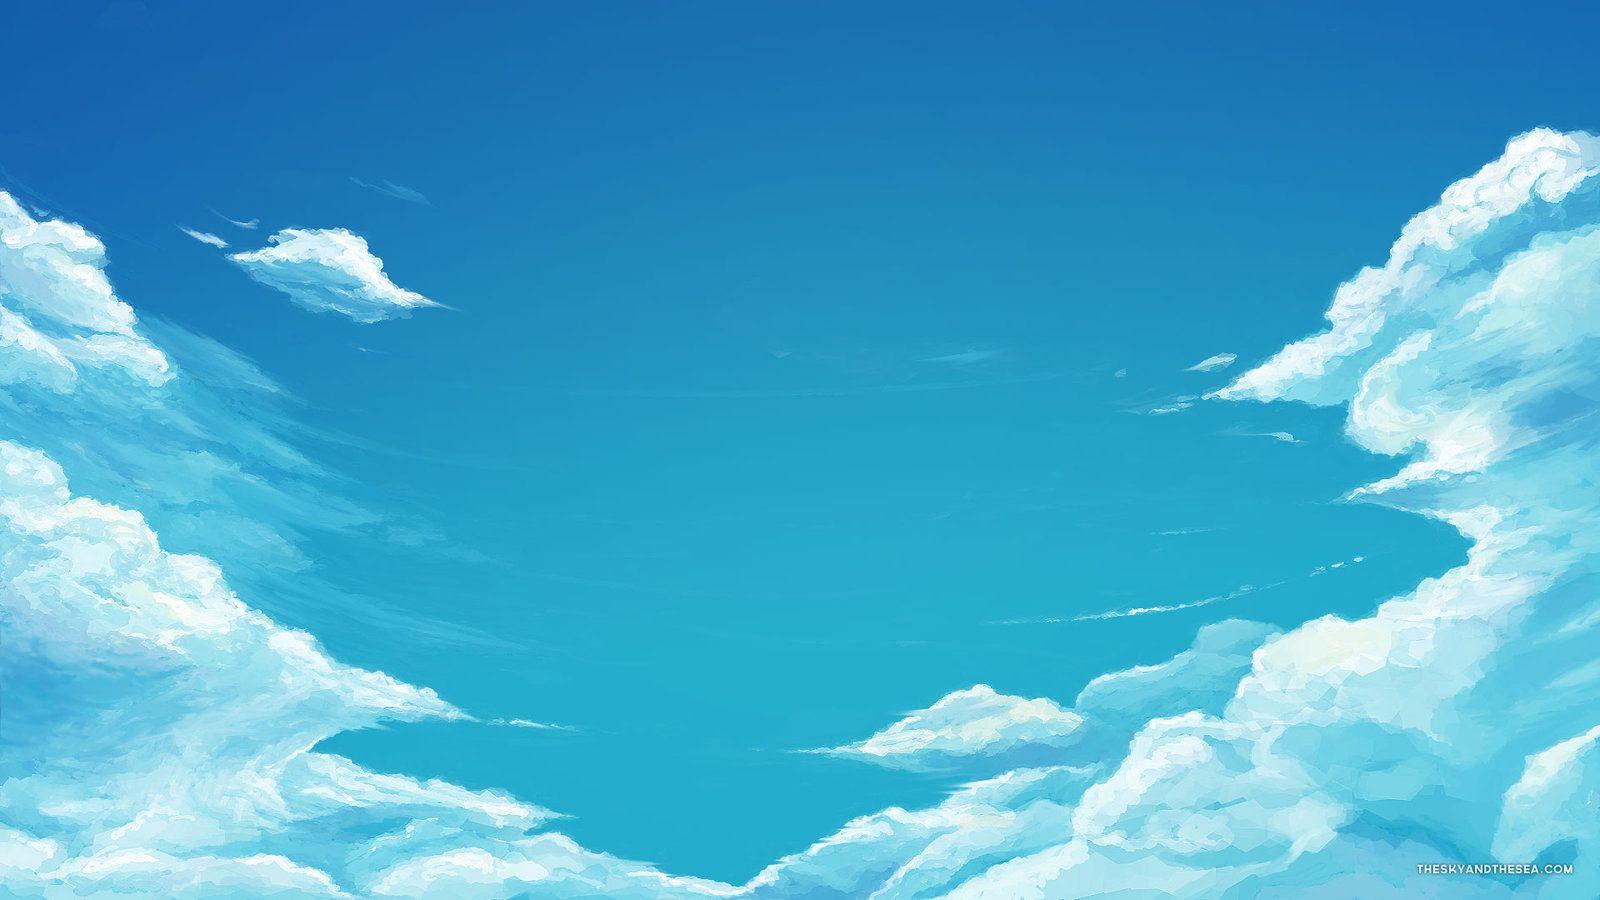 Pin By Sofia Li On Others Sky Anime Sky Aesthetic Blue Sky Wallpaper